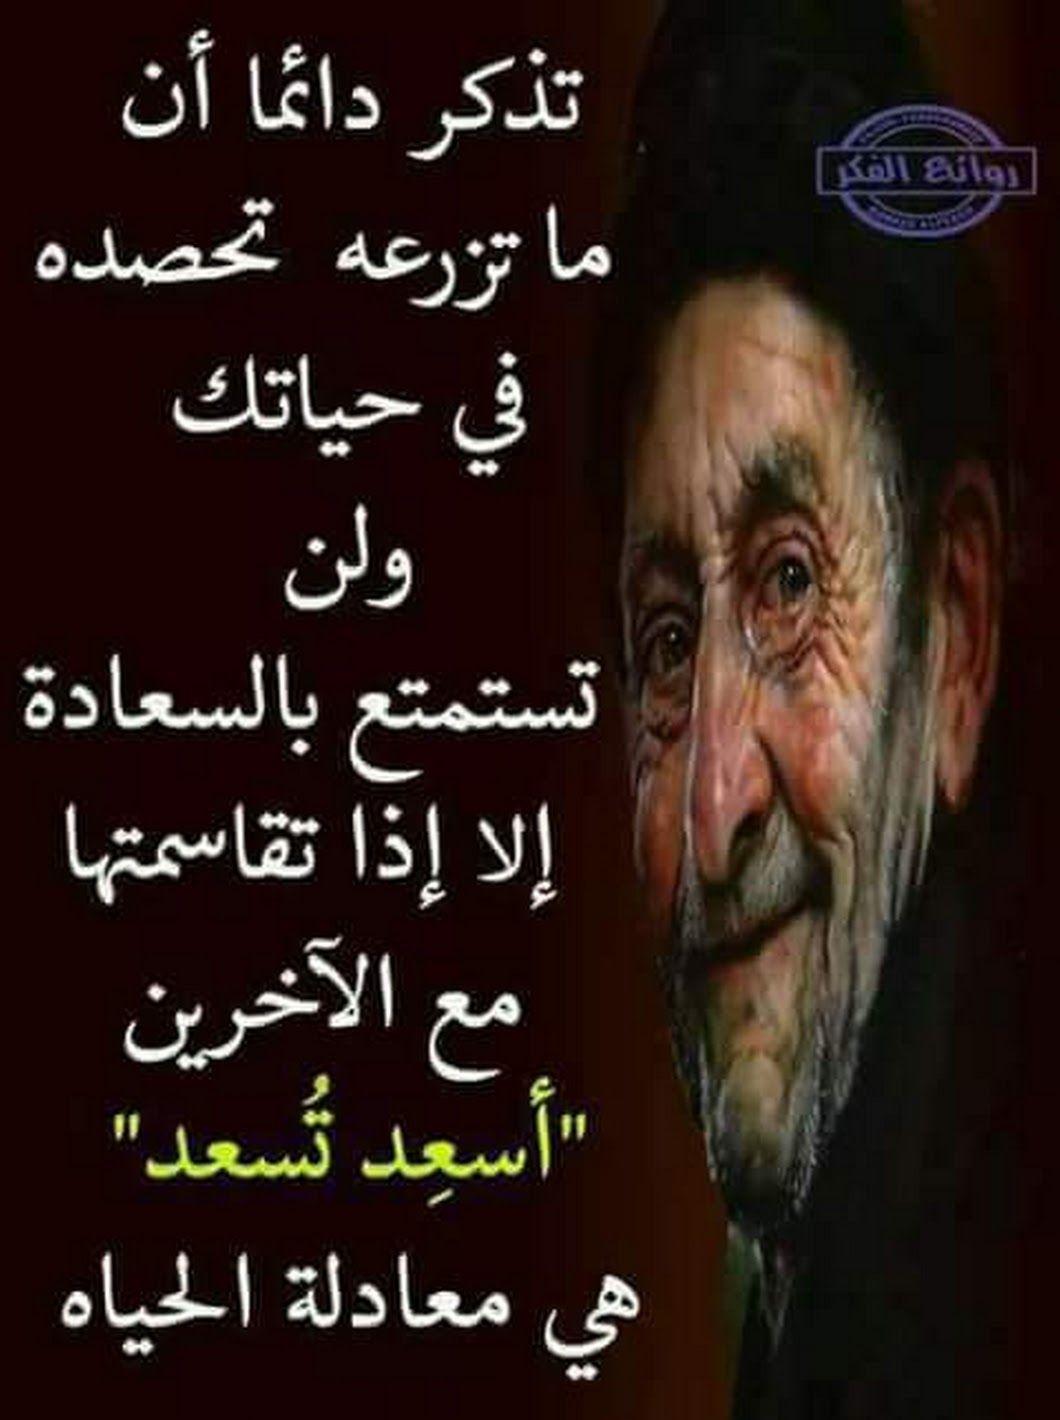 Pin By Nacer Naili On Nacer213 Quotes Words Imam Ali